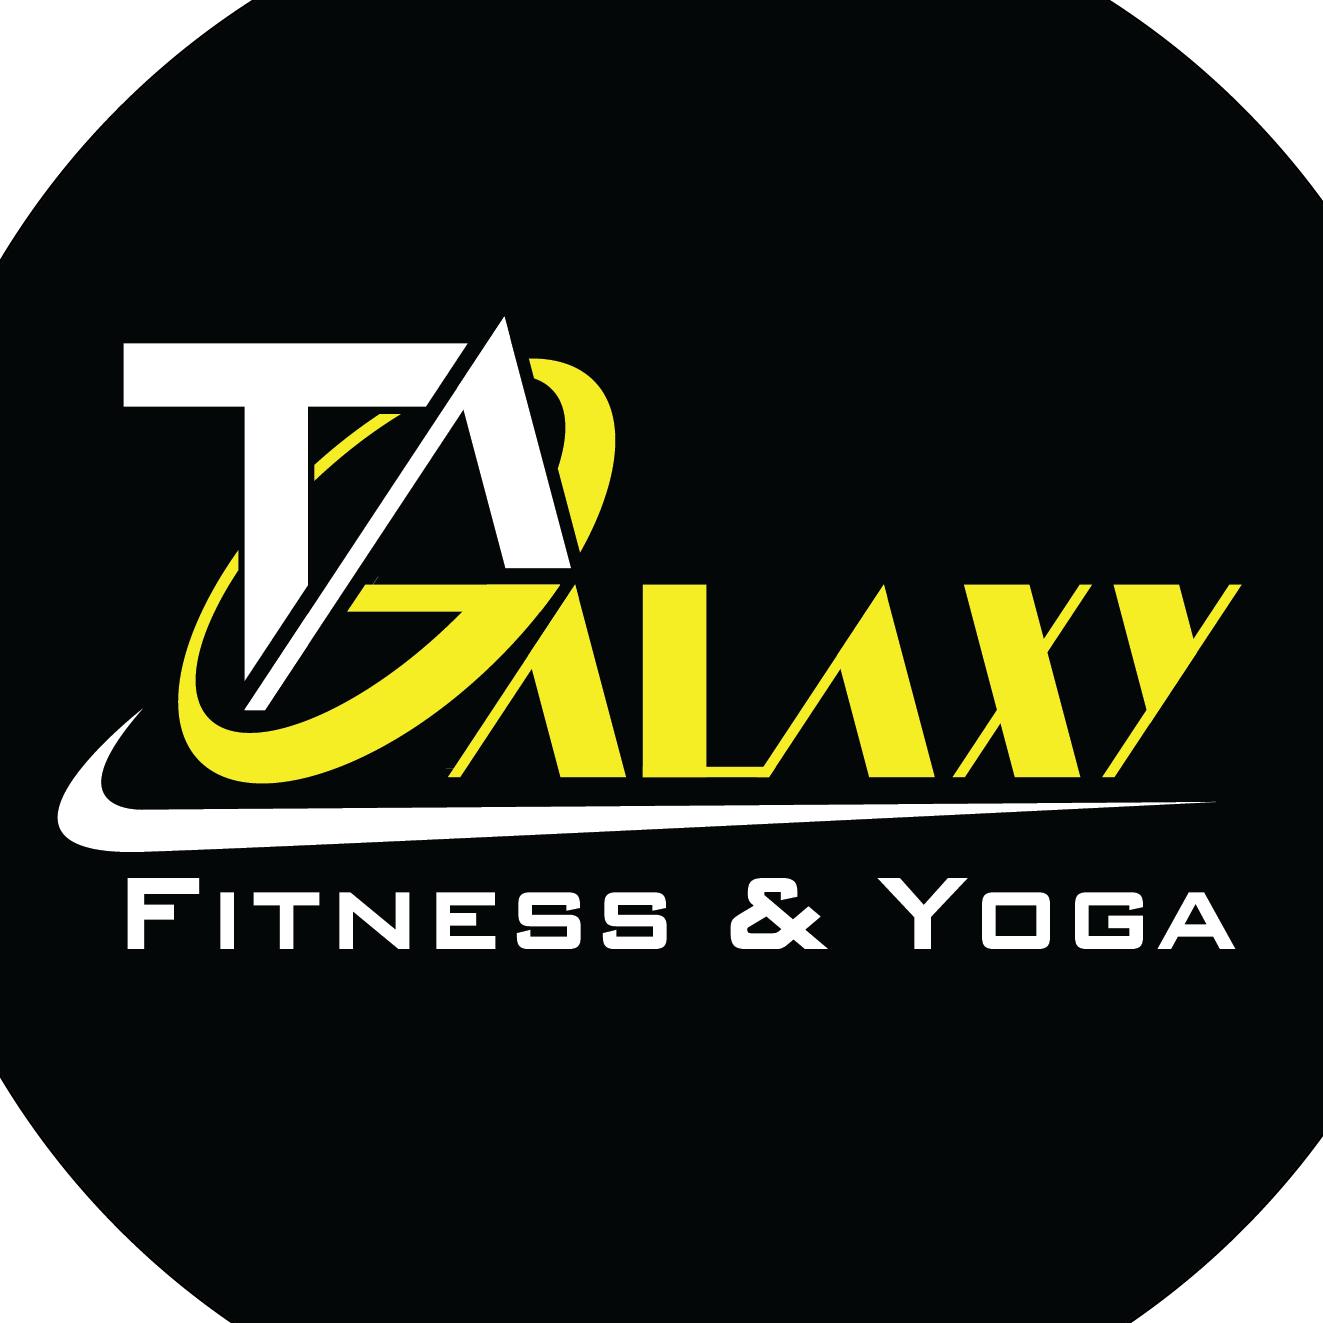 Trung tâm Galaxy Fitness & Yoga Center